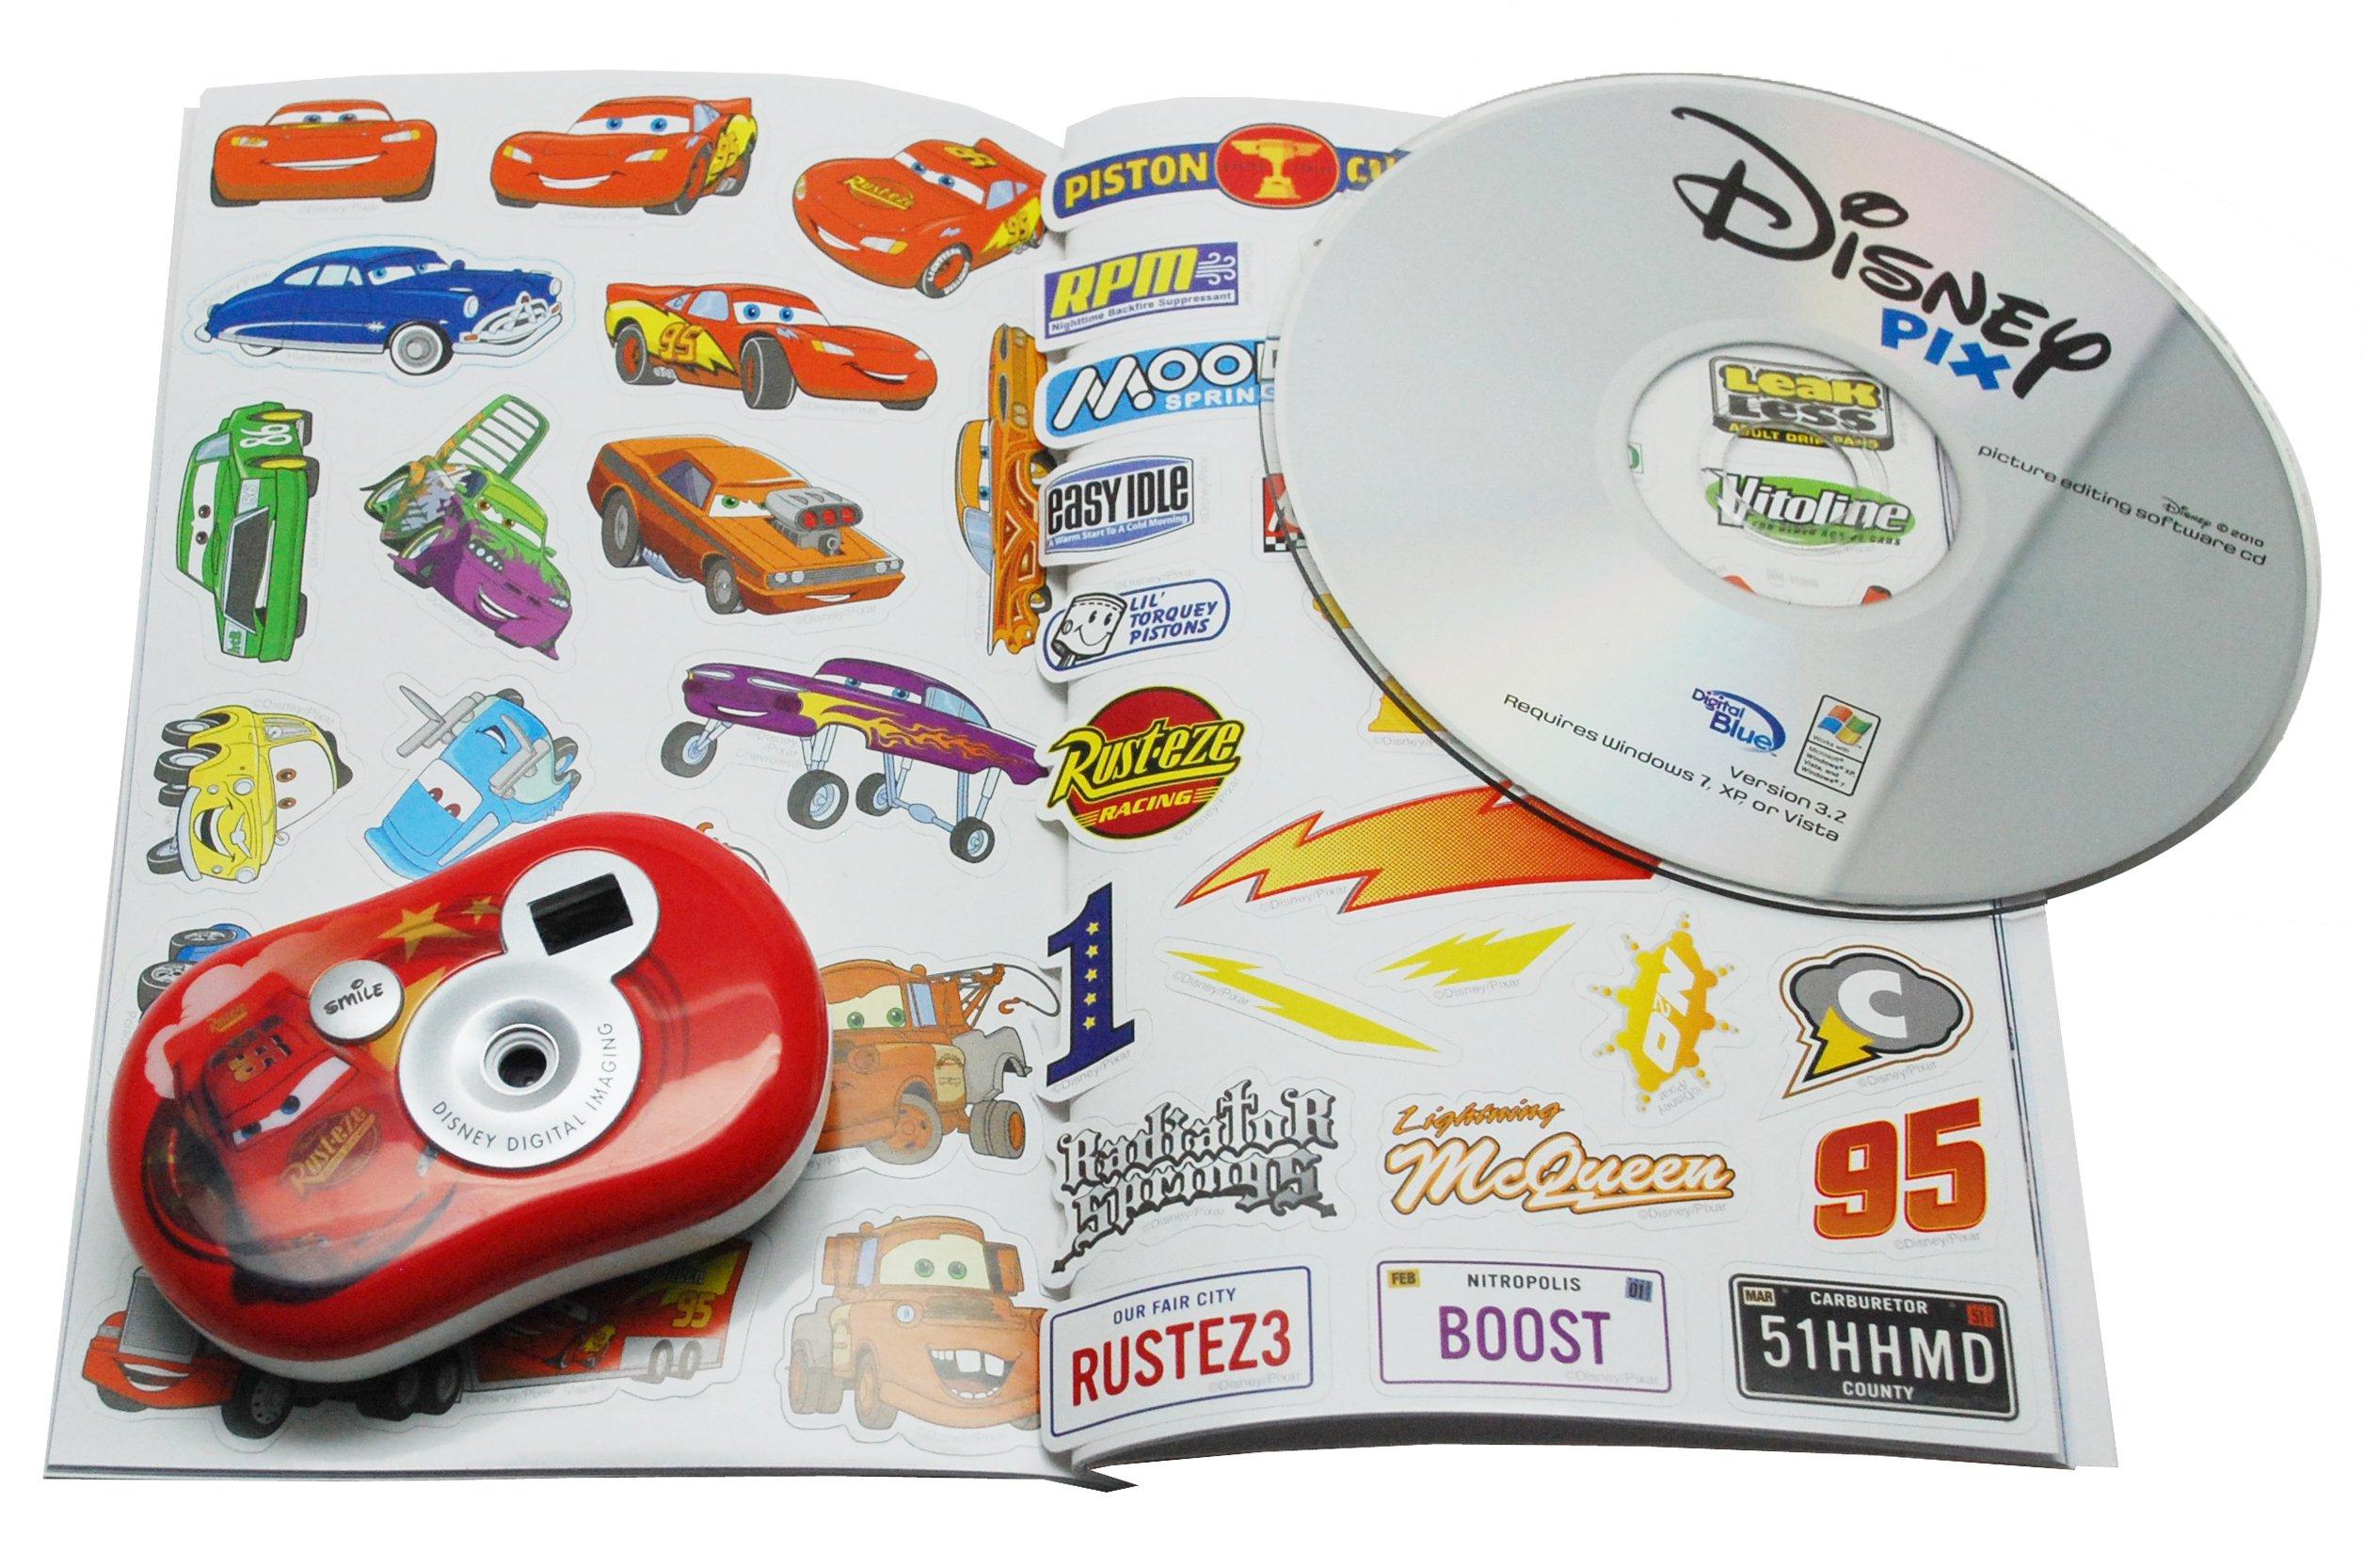 Digital Blue Disney Pix Micro Camera Creativity Kit - Cars by Digital Blue (Image #3)